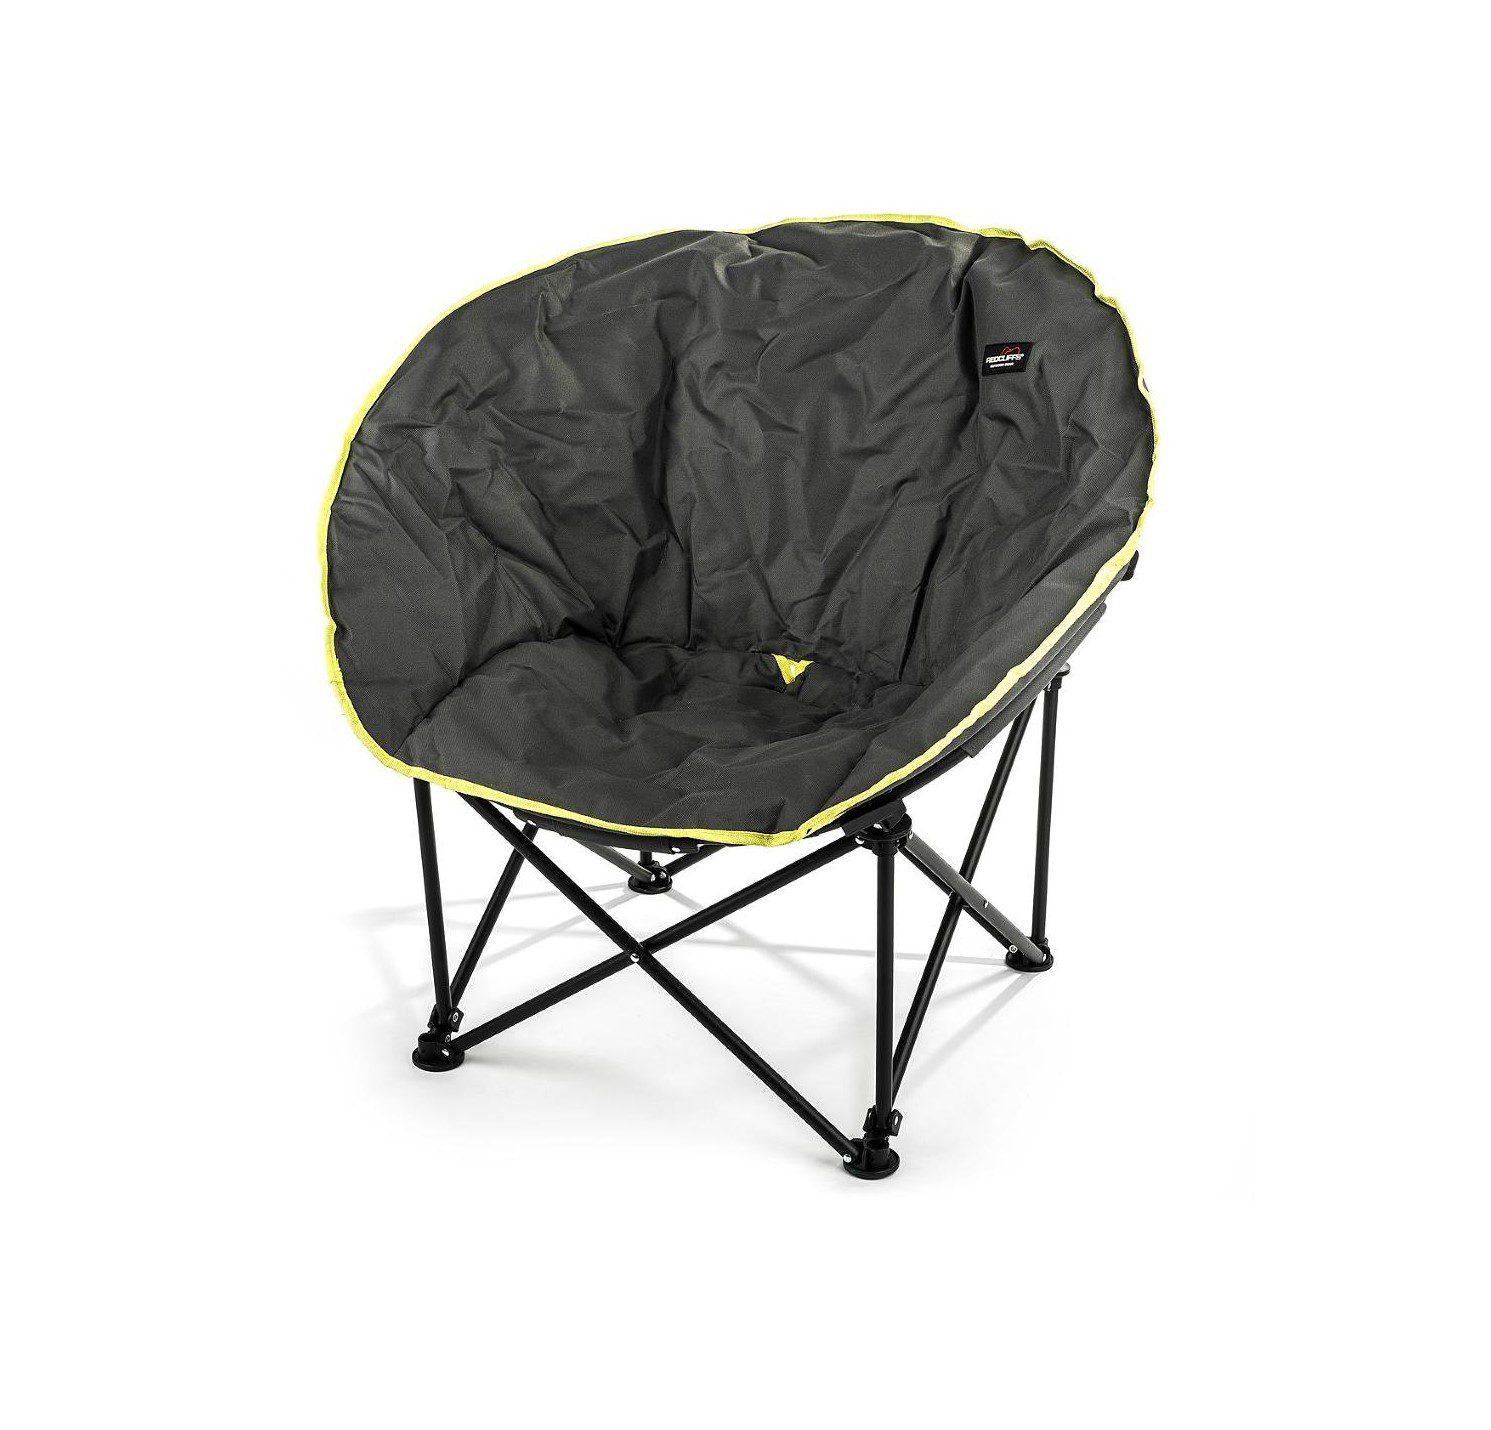 Redcliffs Small Moon Chair - Green Trim